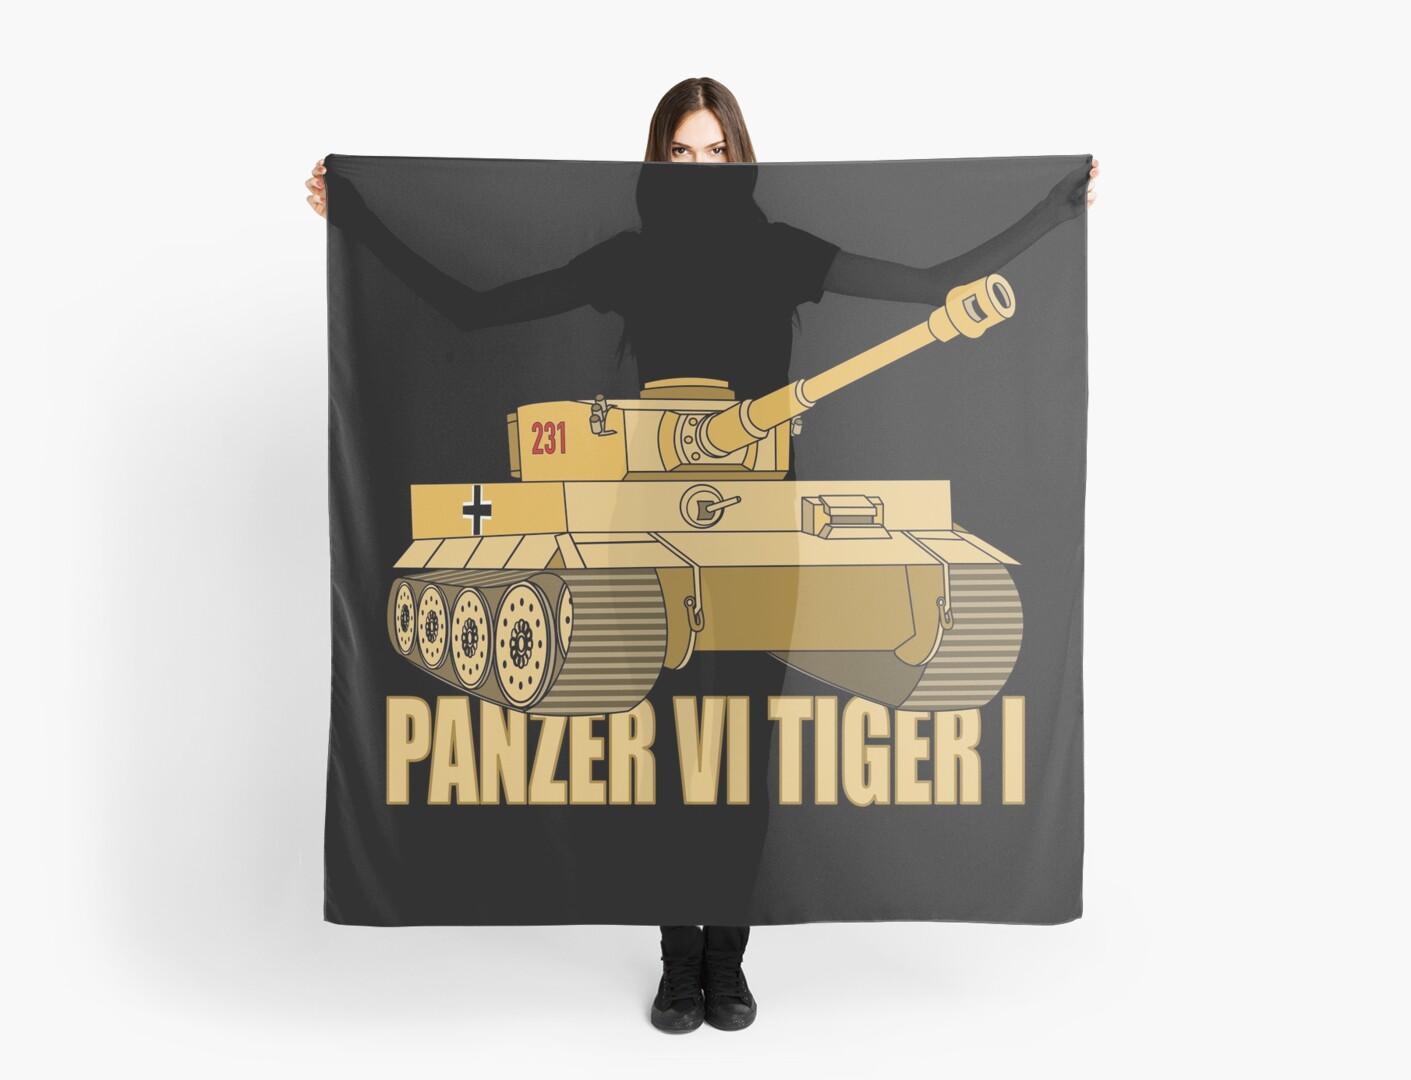 'Panzer VI Tiger I Tank Gift WW2 German Army Tanks' Scarf by Battlefield